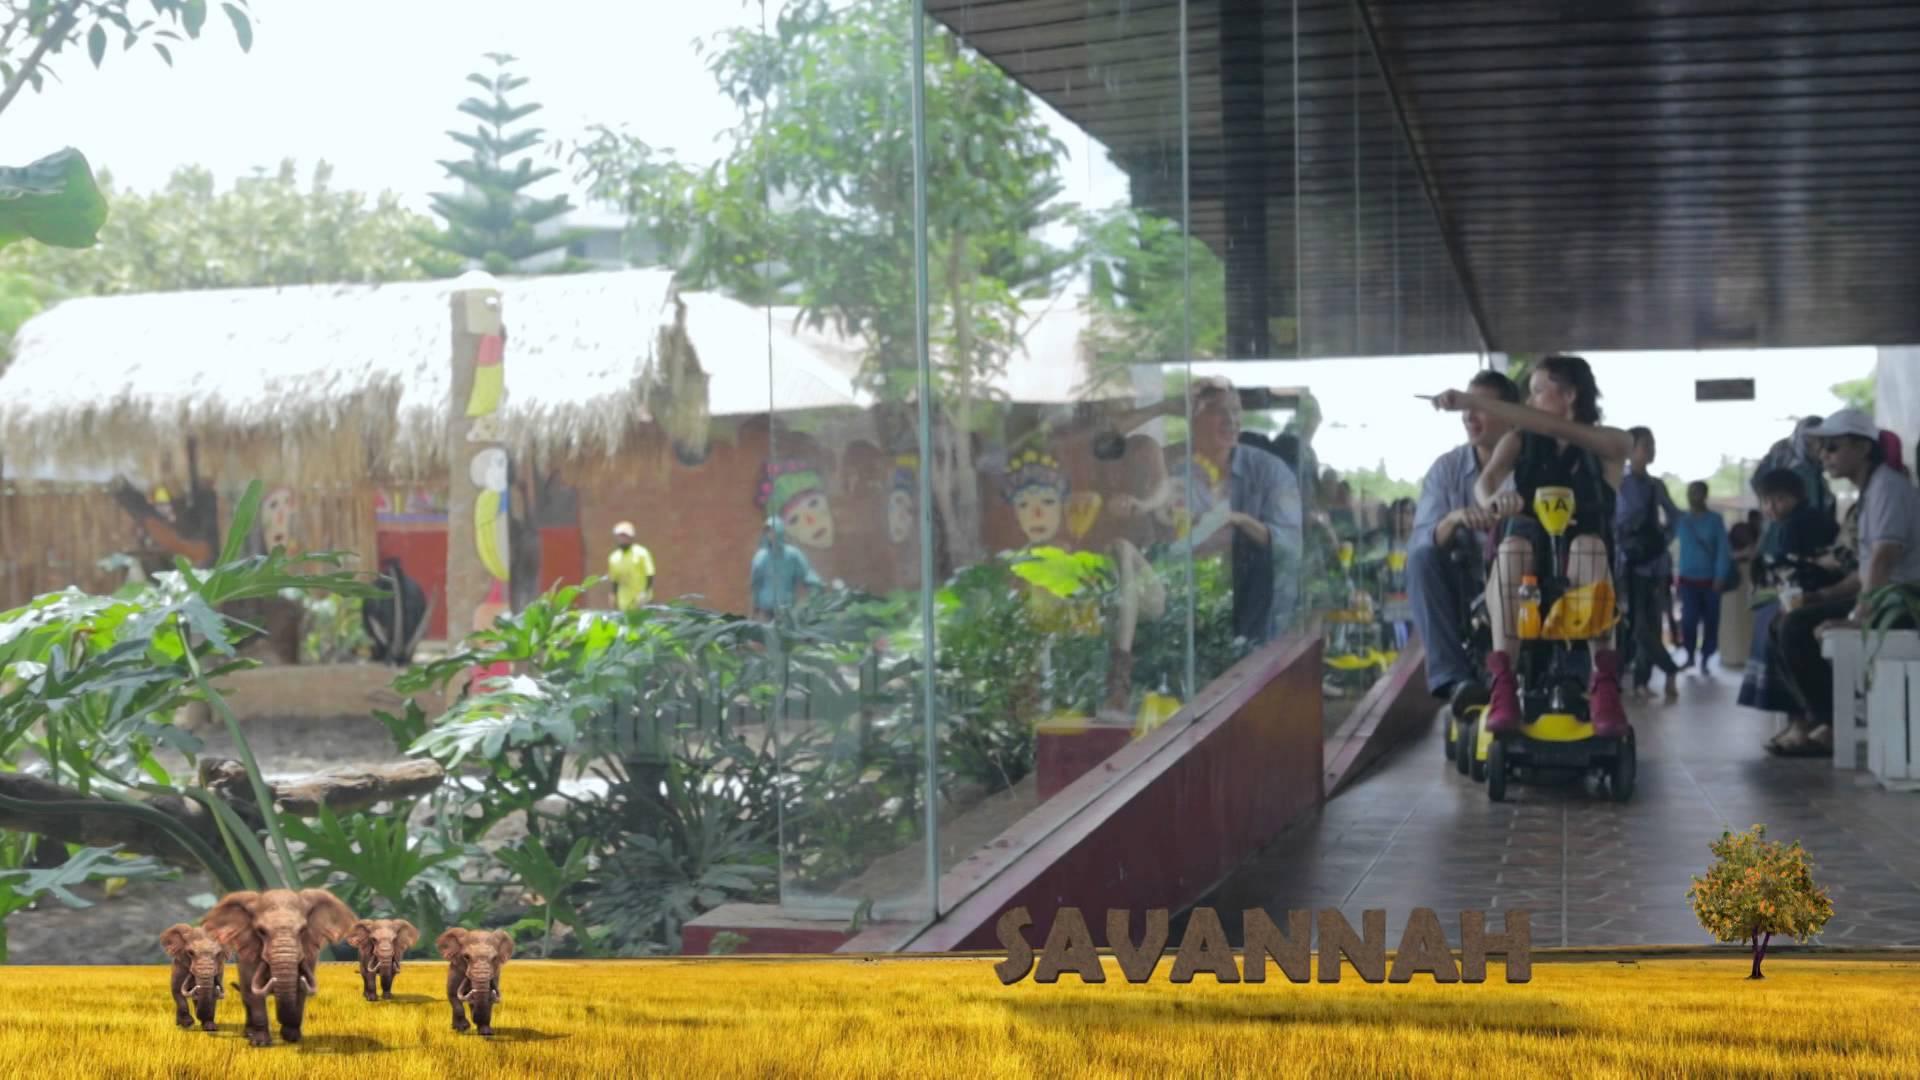 Jawa Timur Park 2 Museum Satwa Batu Secret Zoo Hd